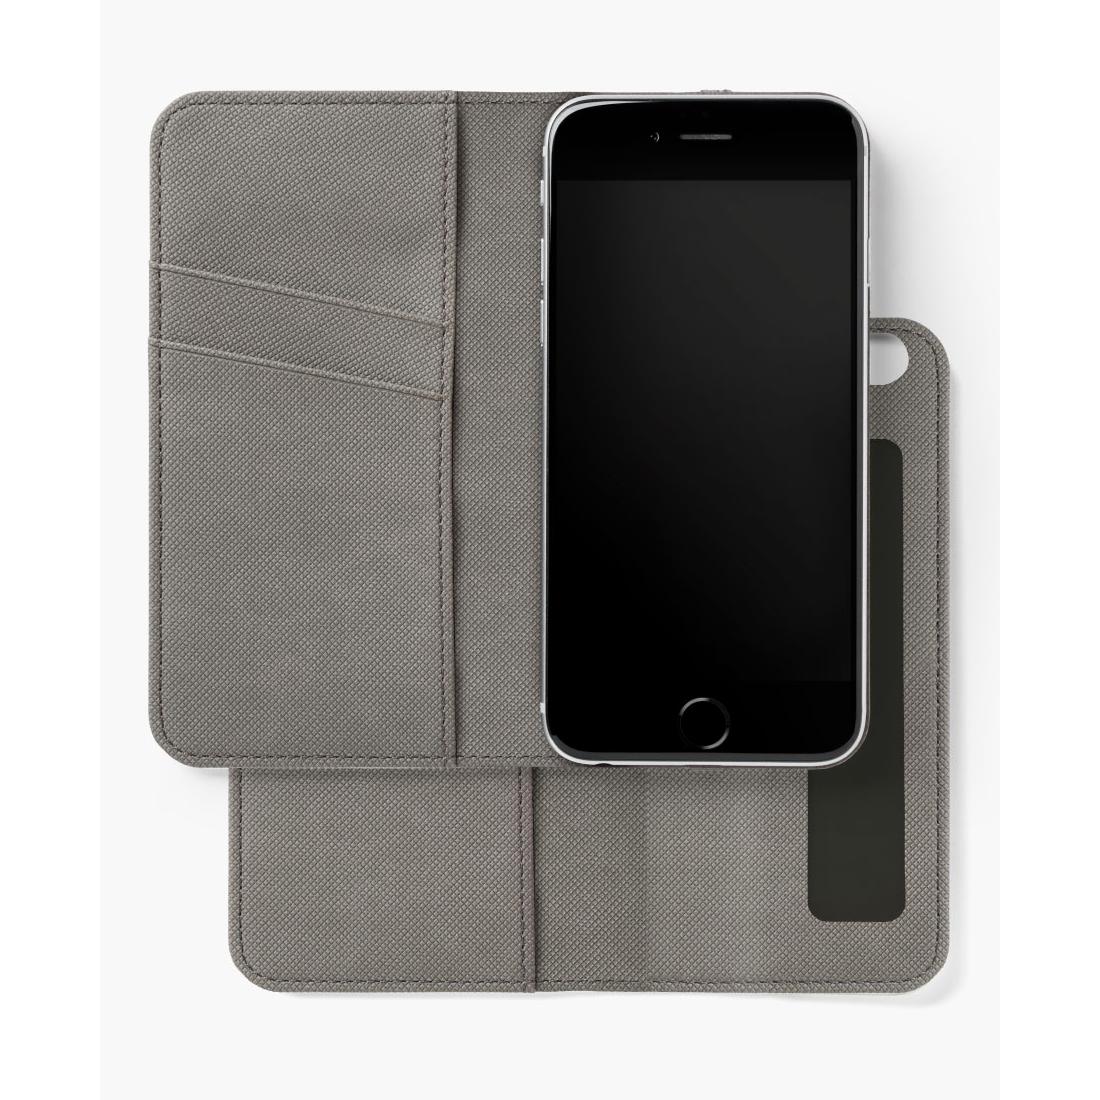 iphone-wallet-open-6-cb2dbde4a7bc2753a82e792def47cb29